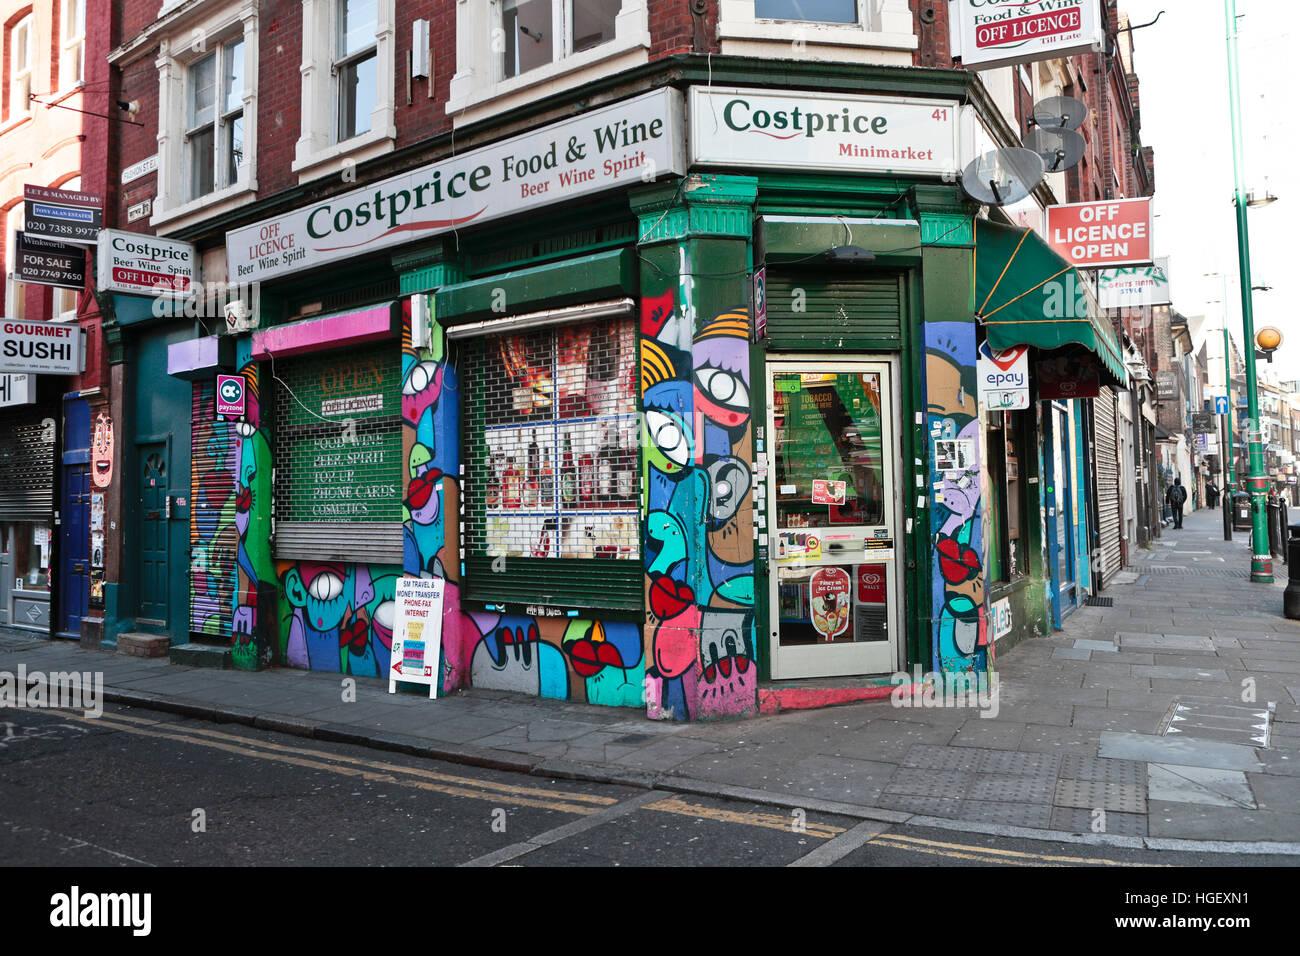 costprice food wine store in brick lane east london uk stock photo royalty free image. Black Bedroom Furniture Sets. Home Design Ideas